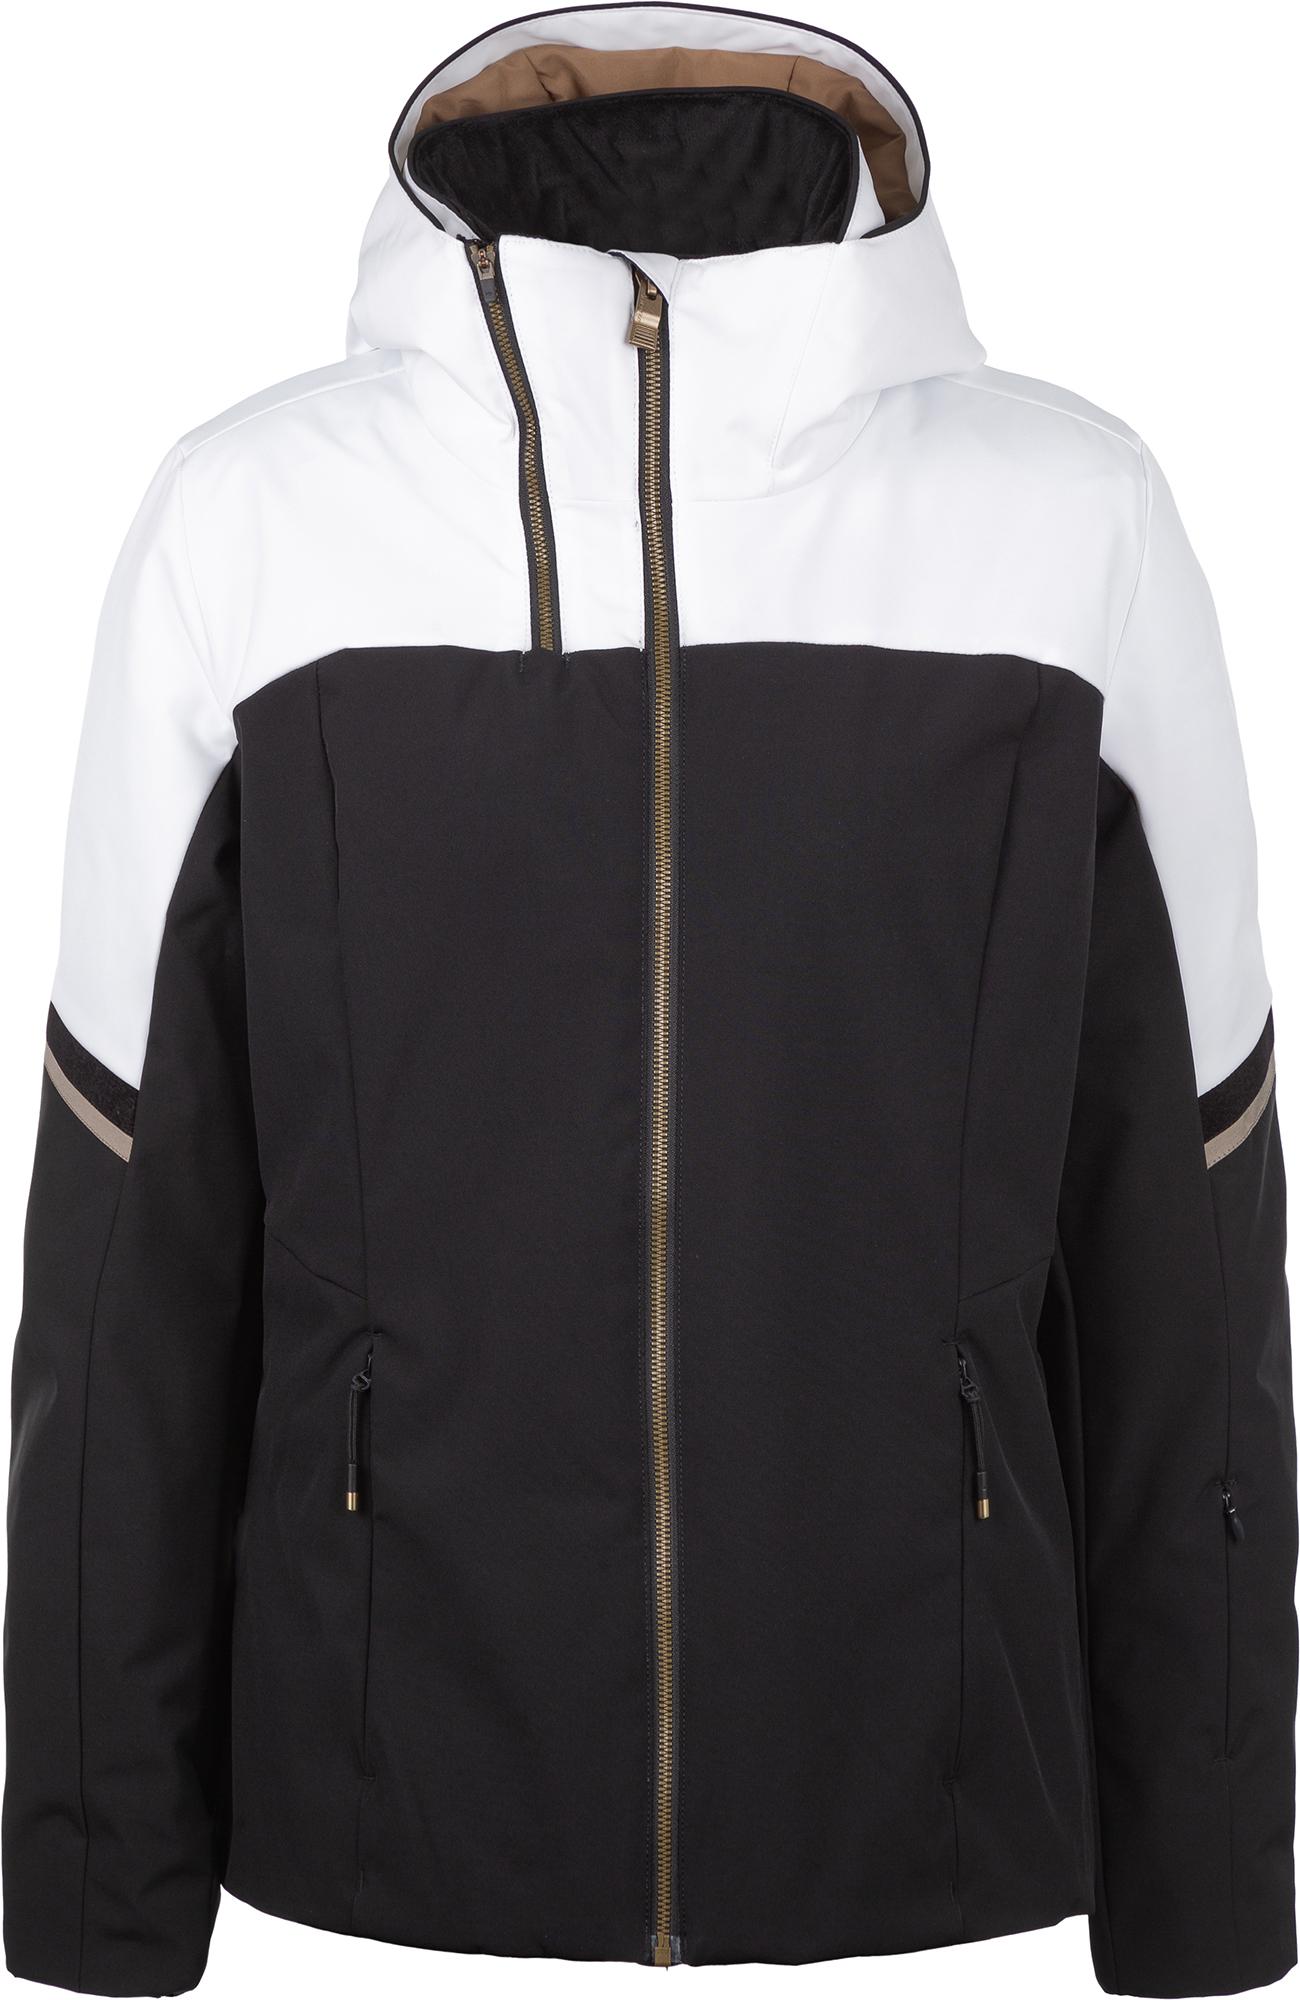 Ziener Куртка утепленная женская Tulla, размер 50